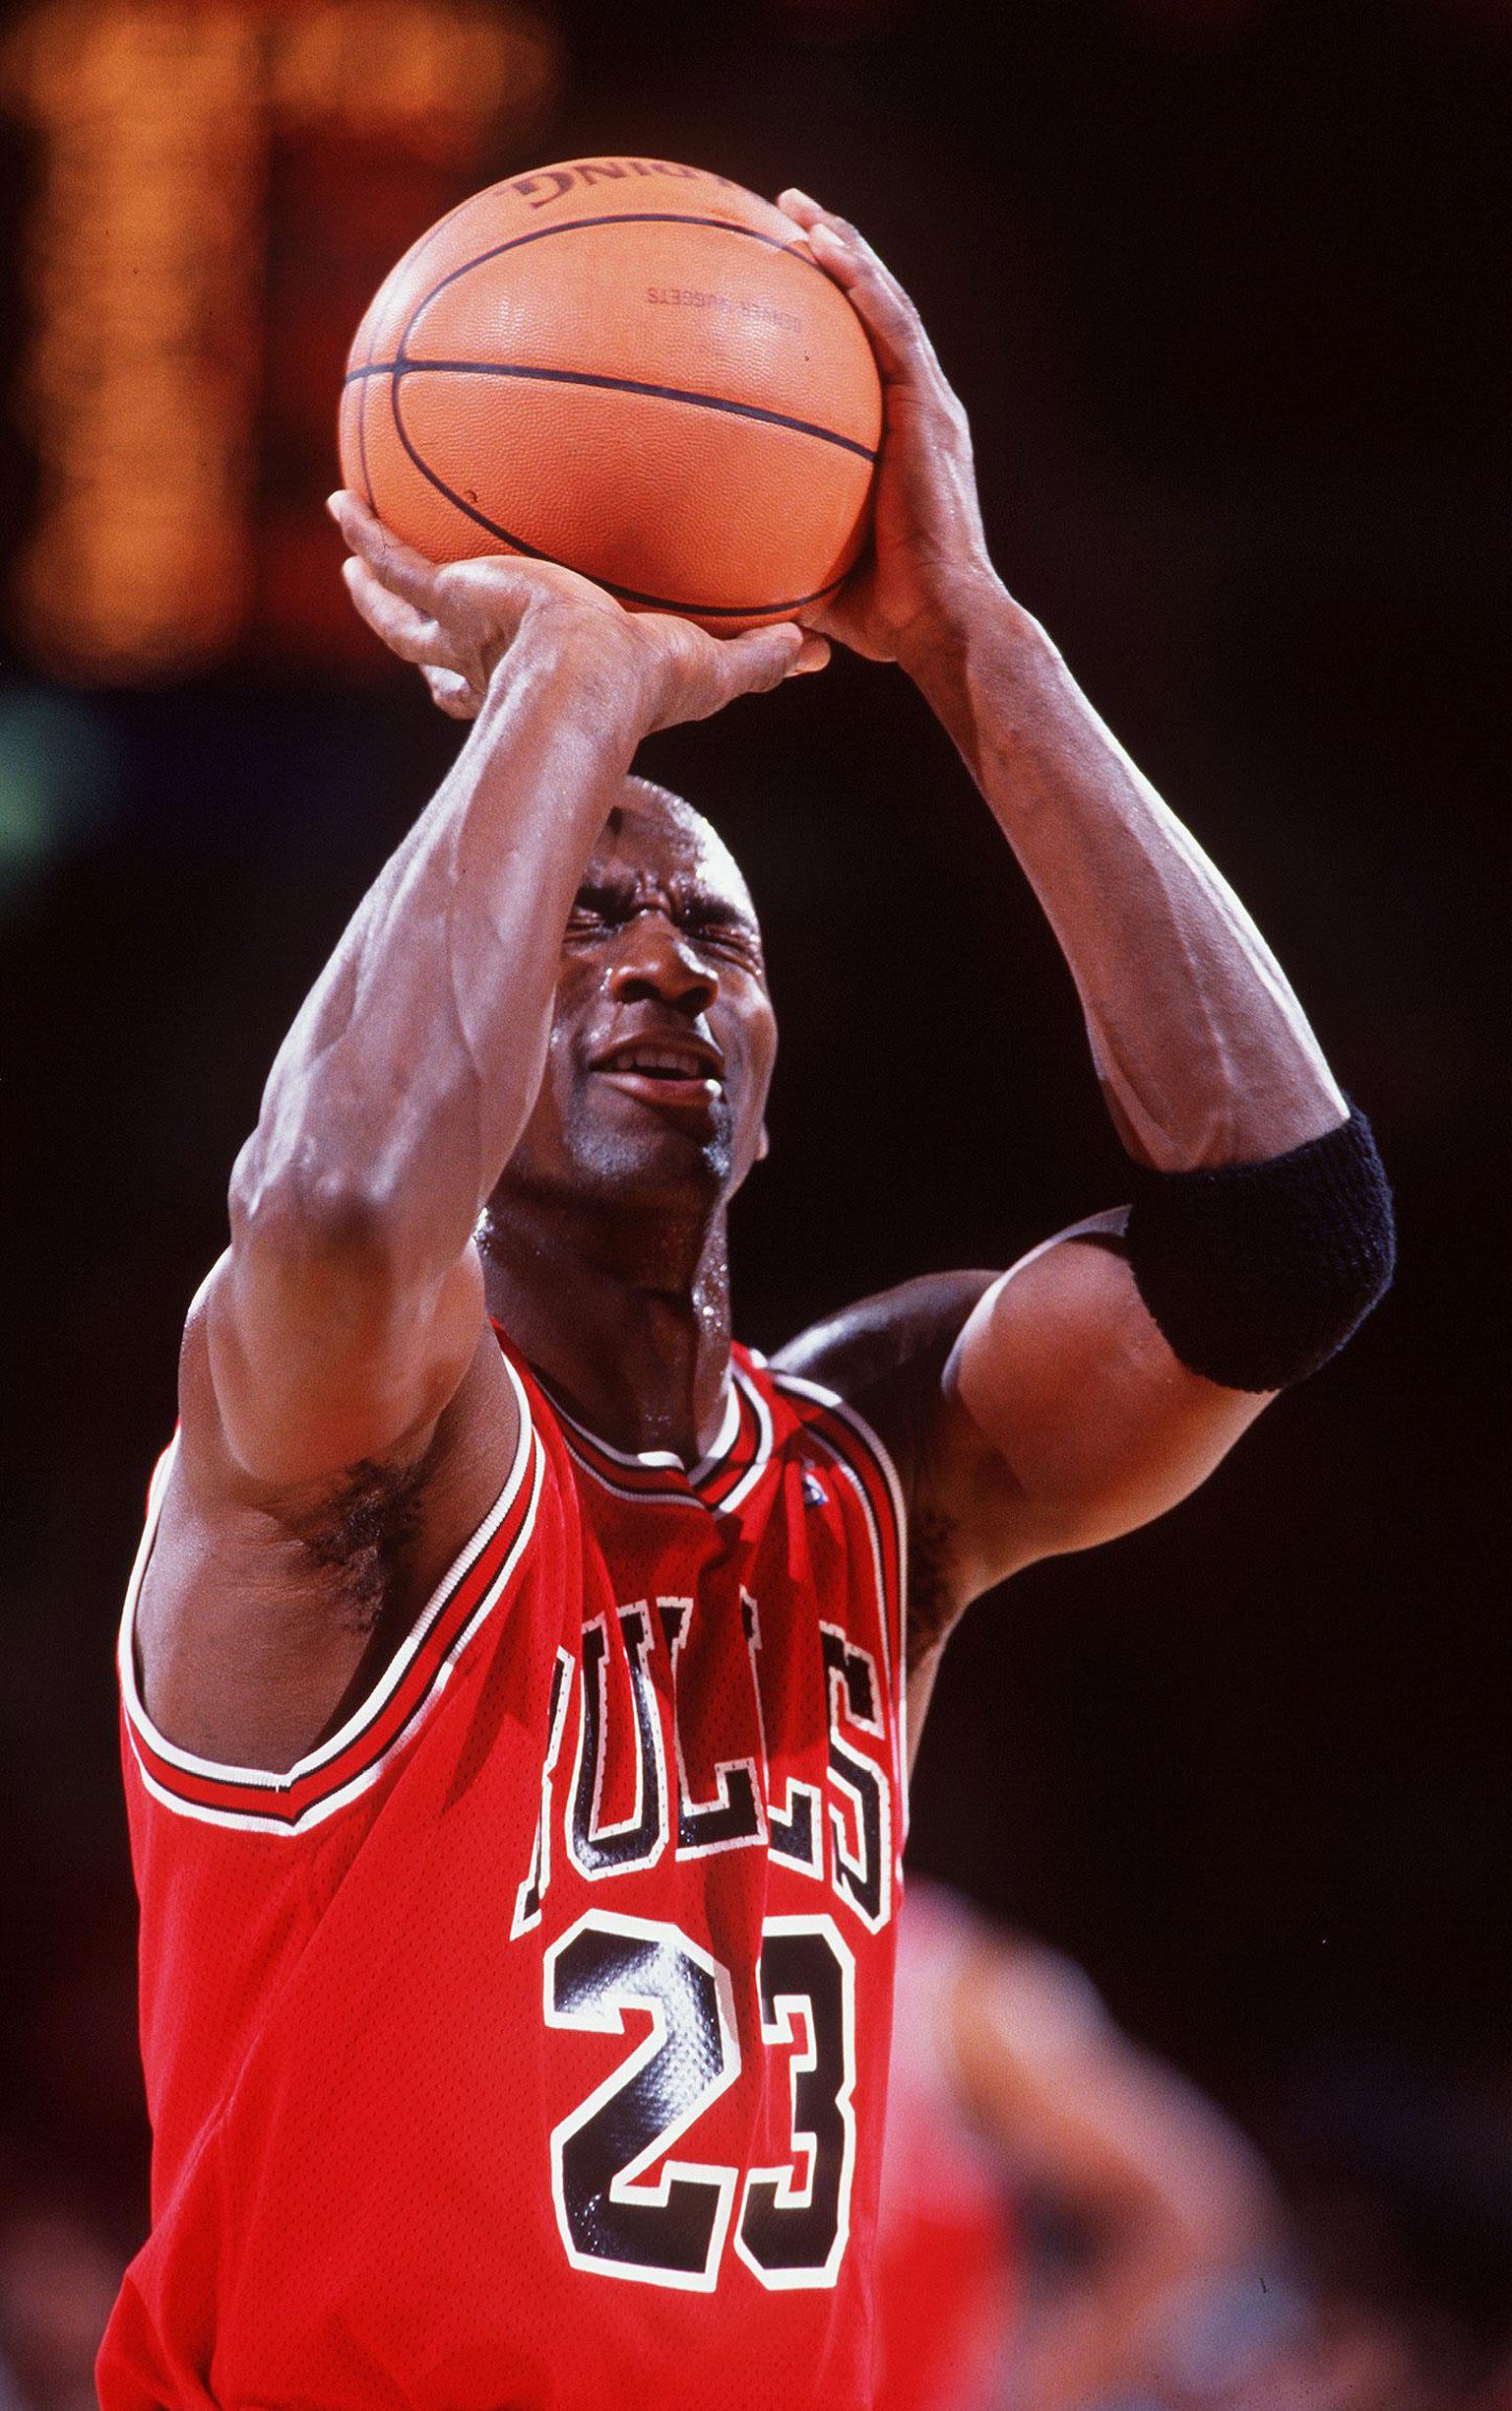 35. Blind Free Throw - Michael Jordan 50 Greatest Moments - ESPN